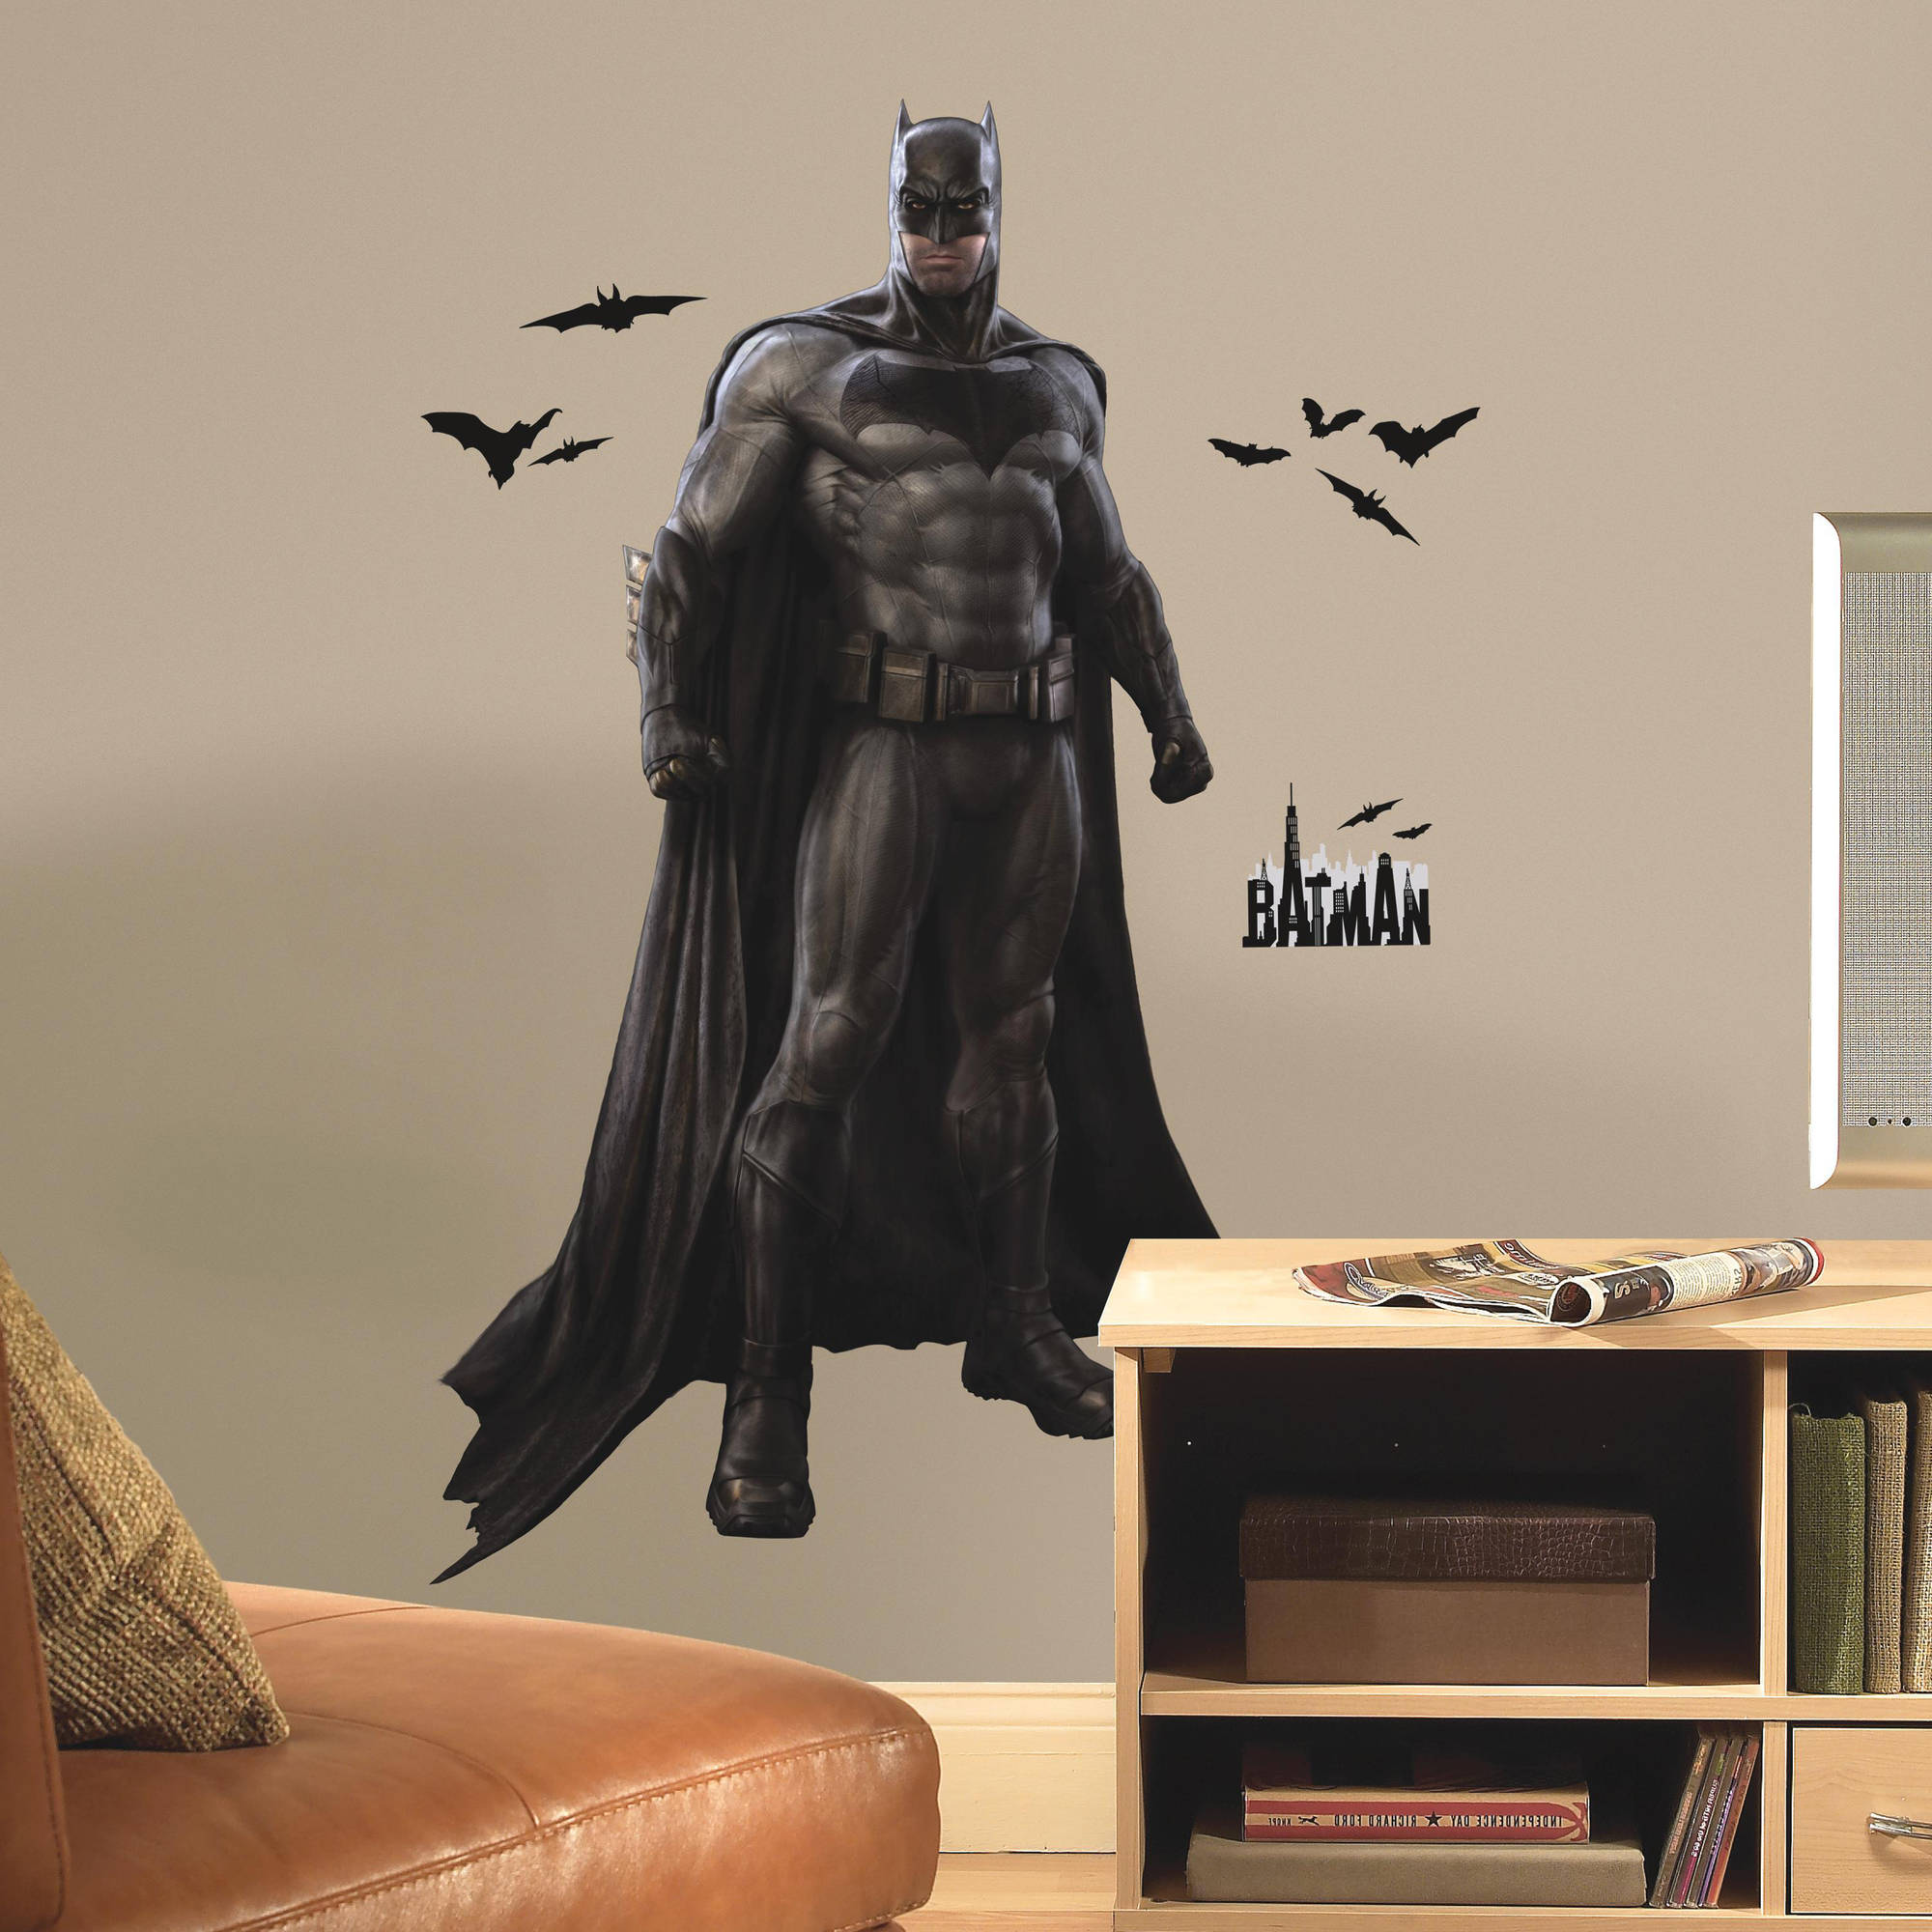 RoomMates Batman vs Superman Batman Peel and Stick Giant Wall Decals by Room Mates